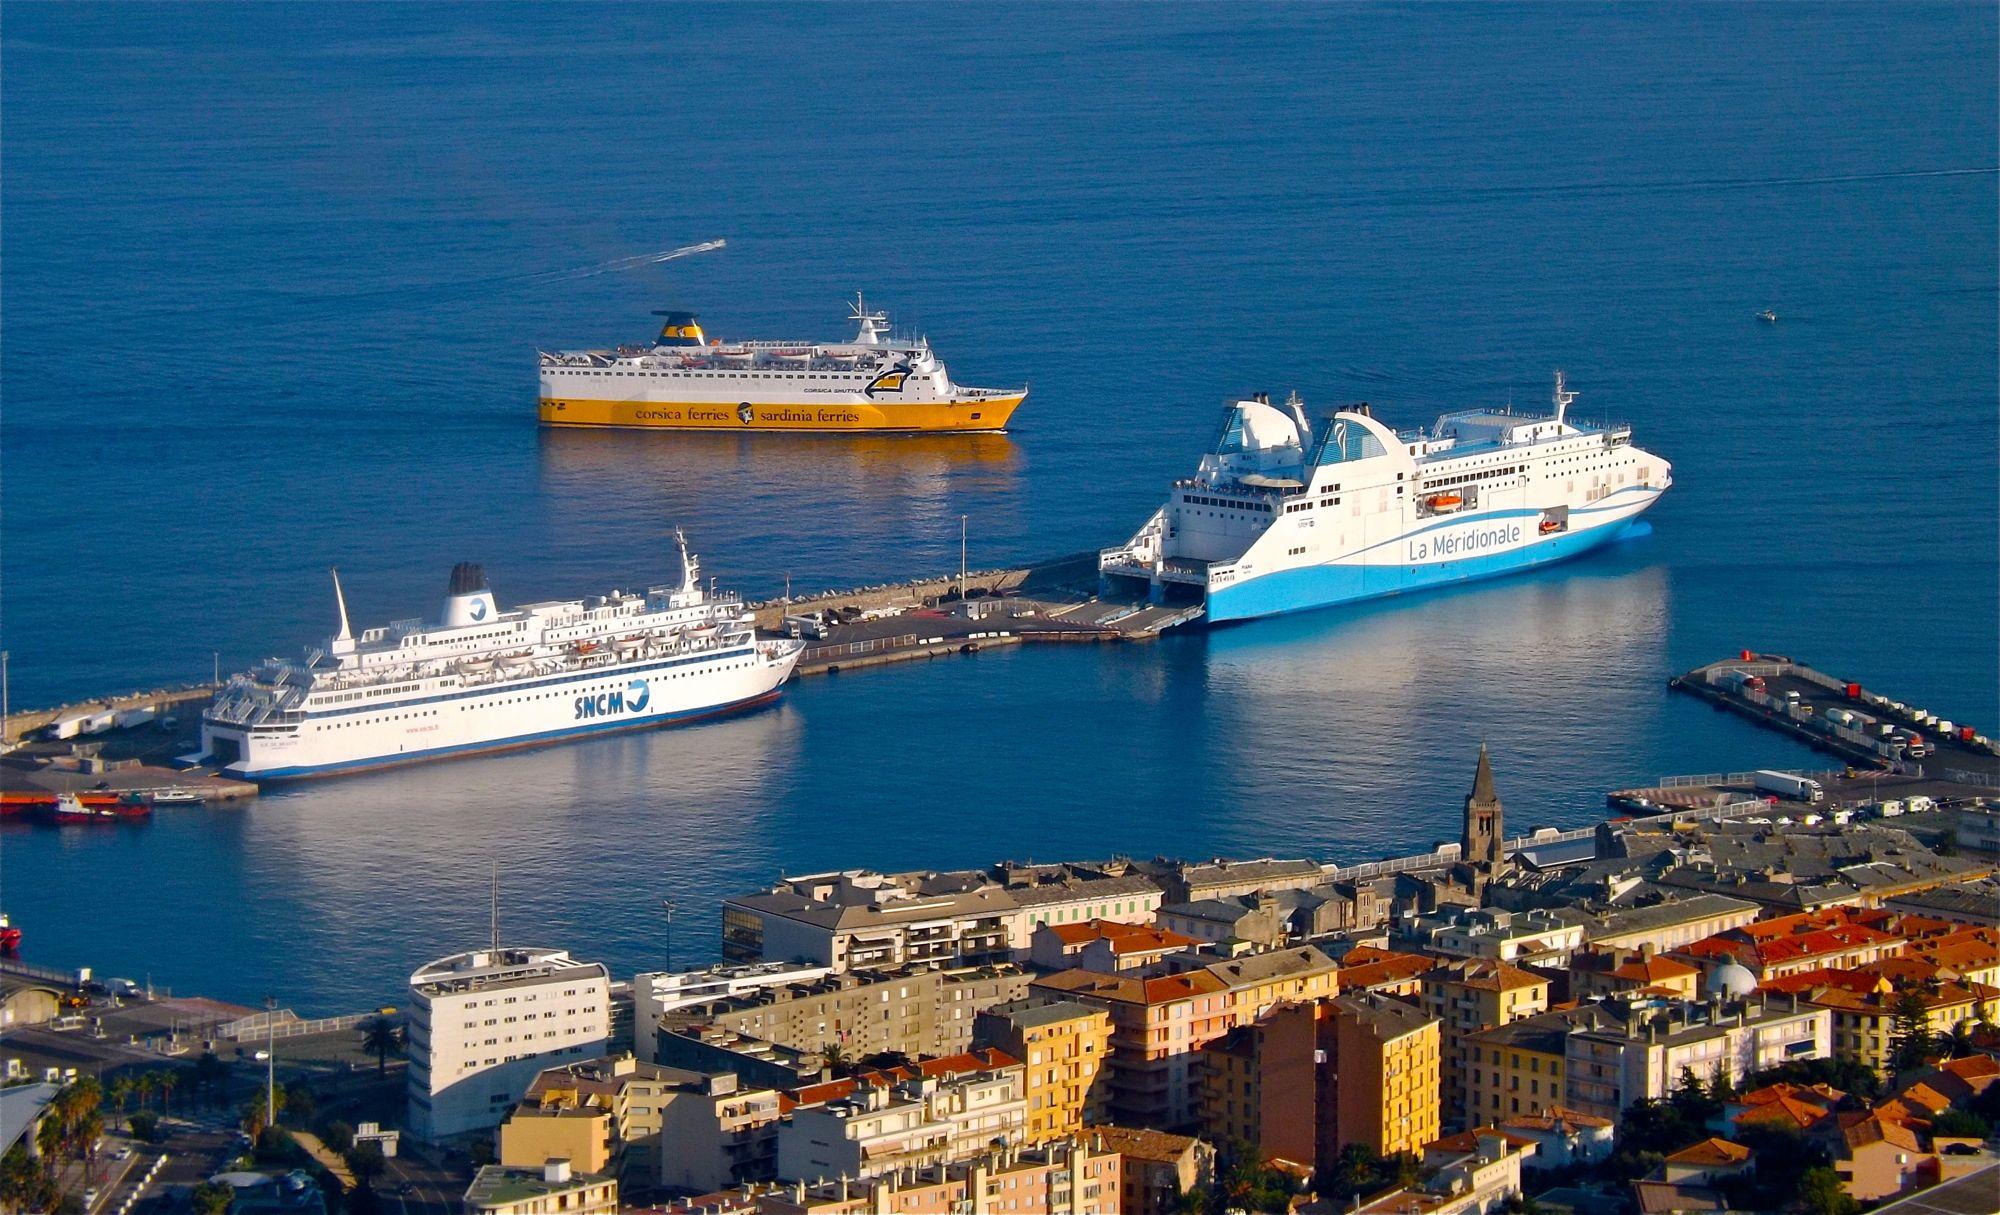 Foto: Louis Moutard-Martin (shipmania.jimdo.com) (Own work) [CC-BY-SA-3.0], via Wikimedia Commons